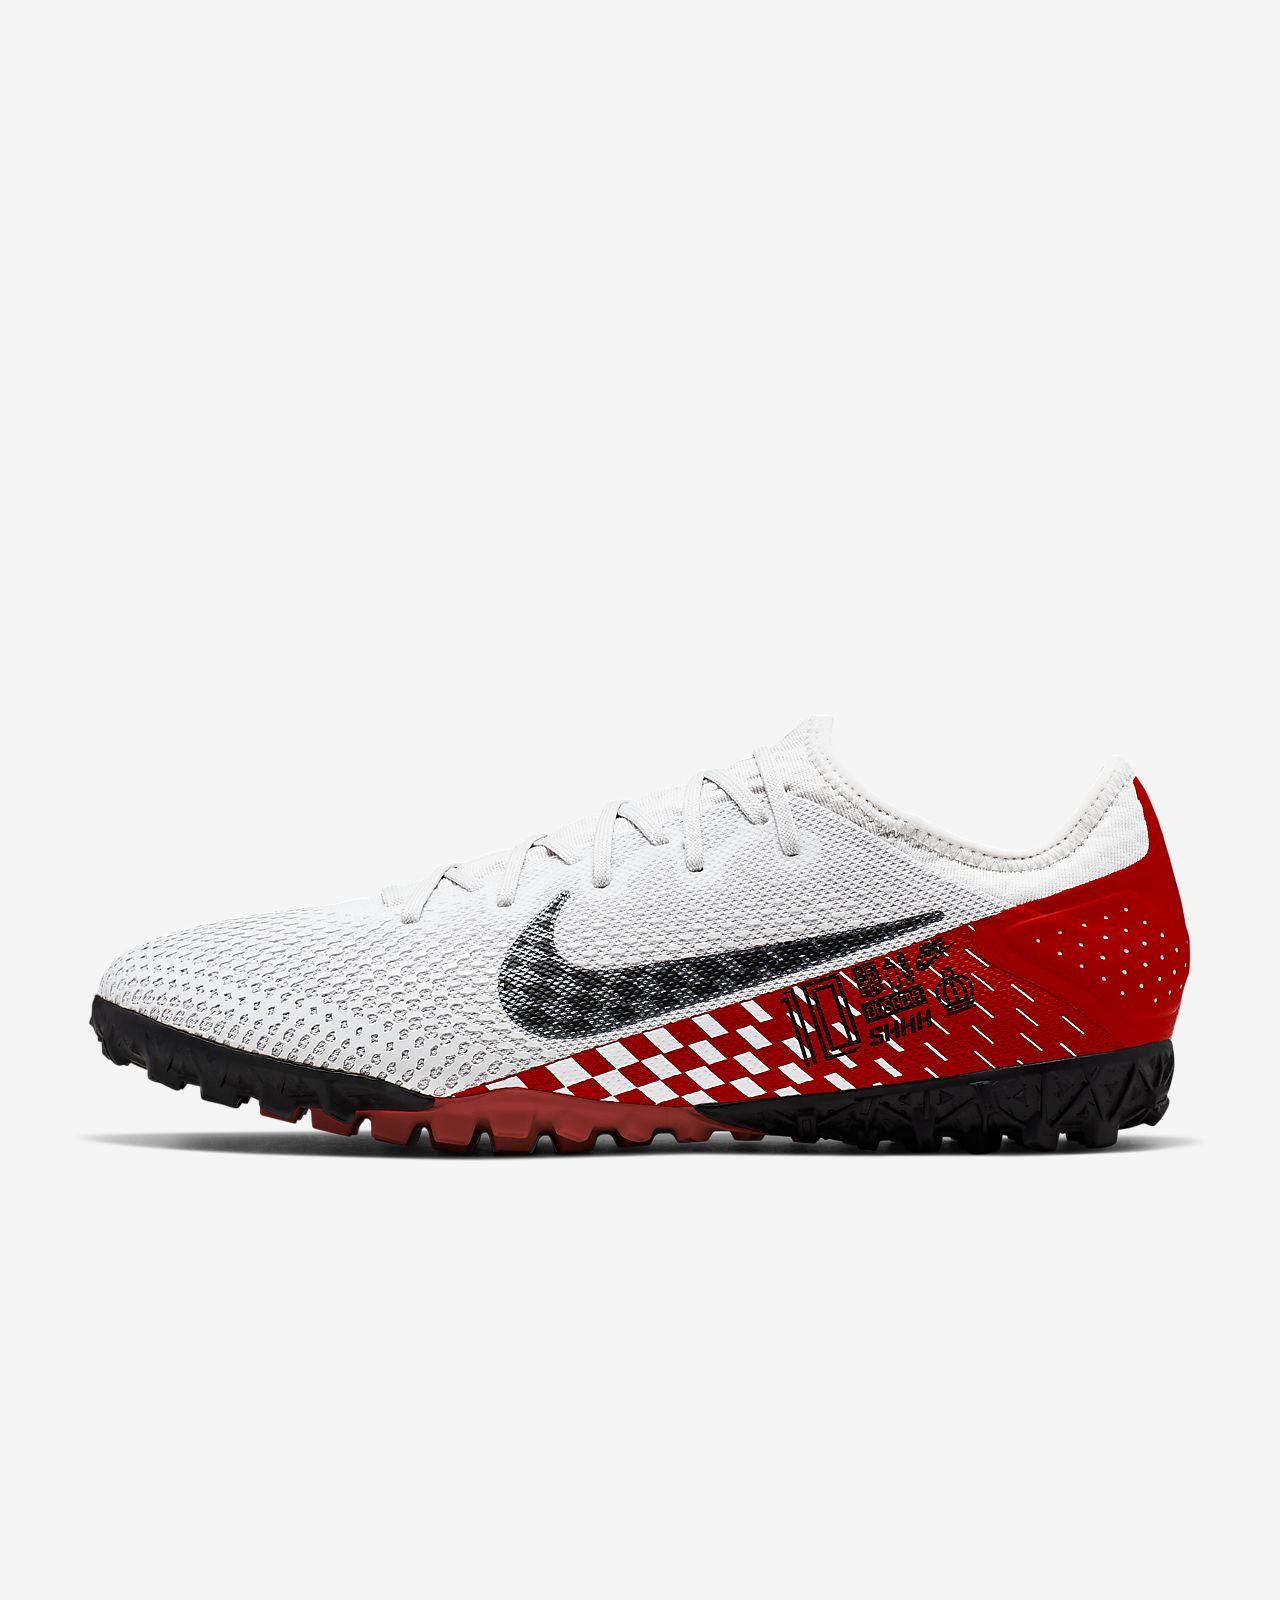 Scarpa da calcio per erba artificiale/sintetica Nike Mercurial Vapor 13 Pro Neymar Jr. TF